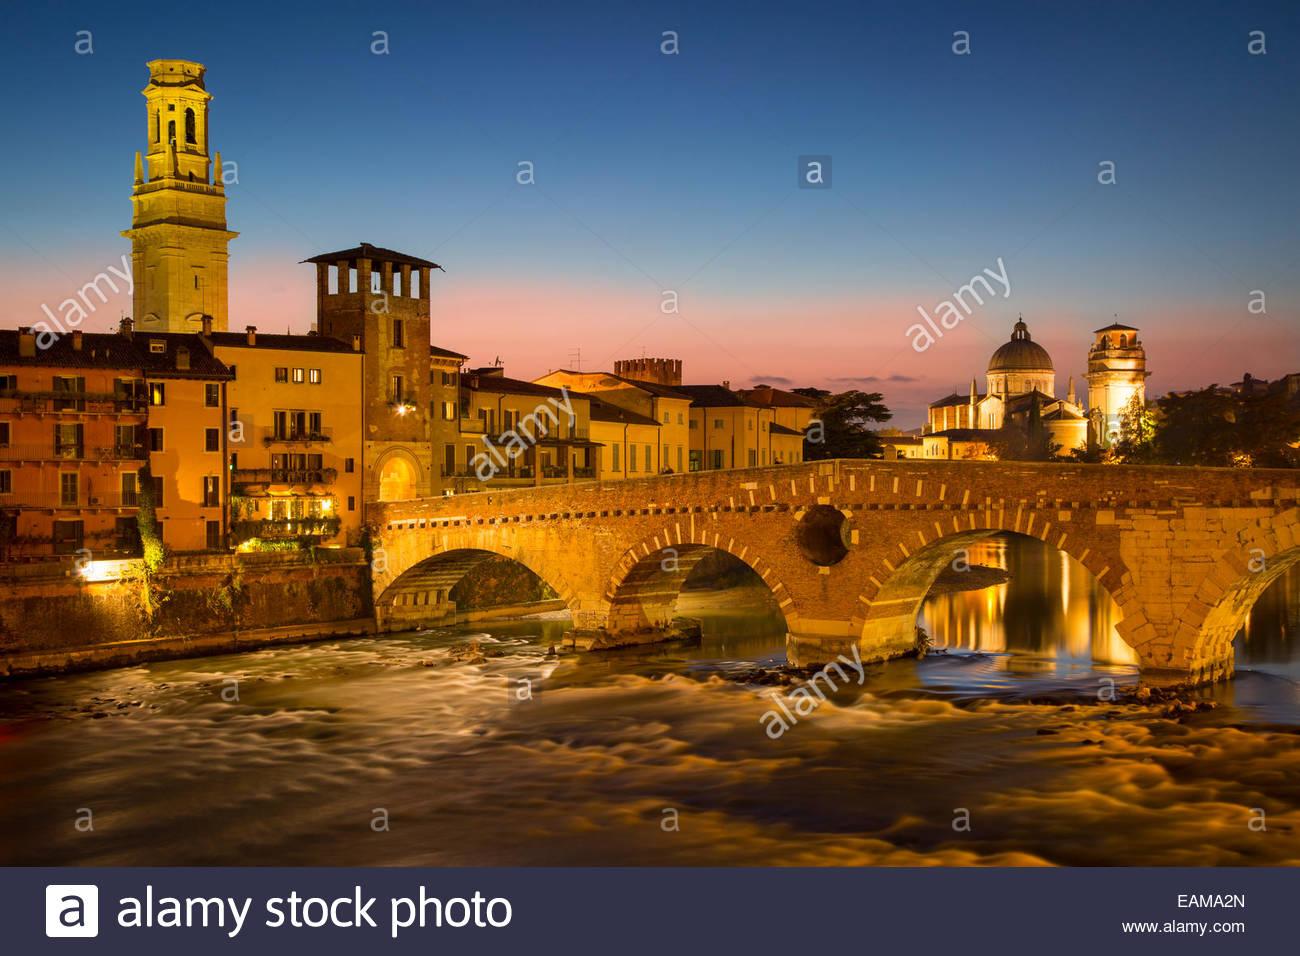 Ponte Pietra over River Adige with Cathedral Anastasia and the skyline of Verona beyond, Veneto, Italy - Stock Image